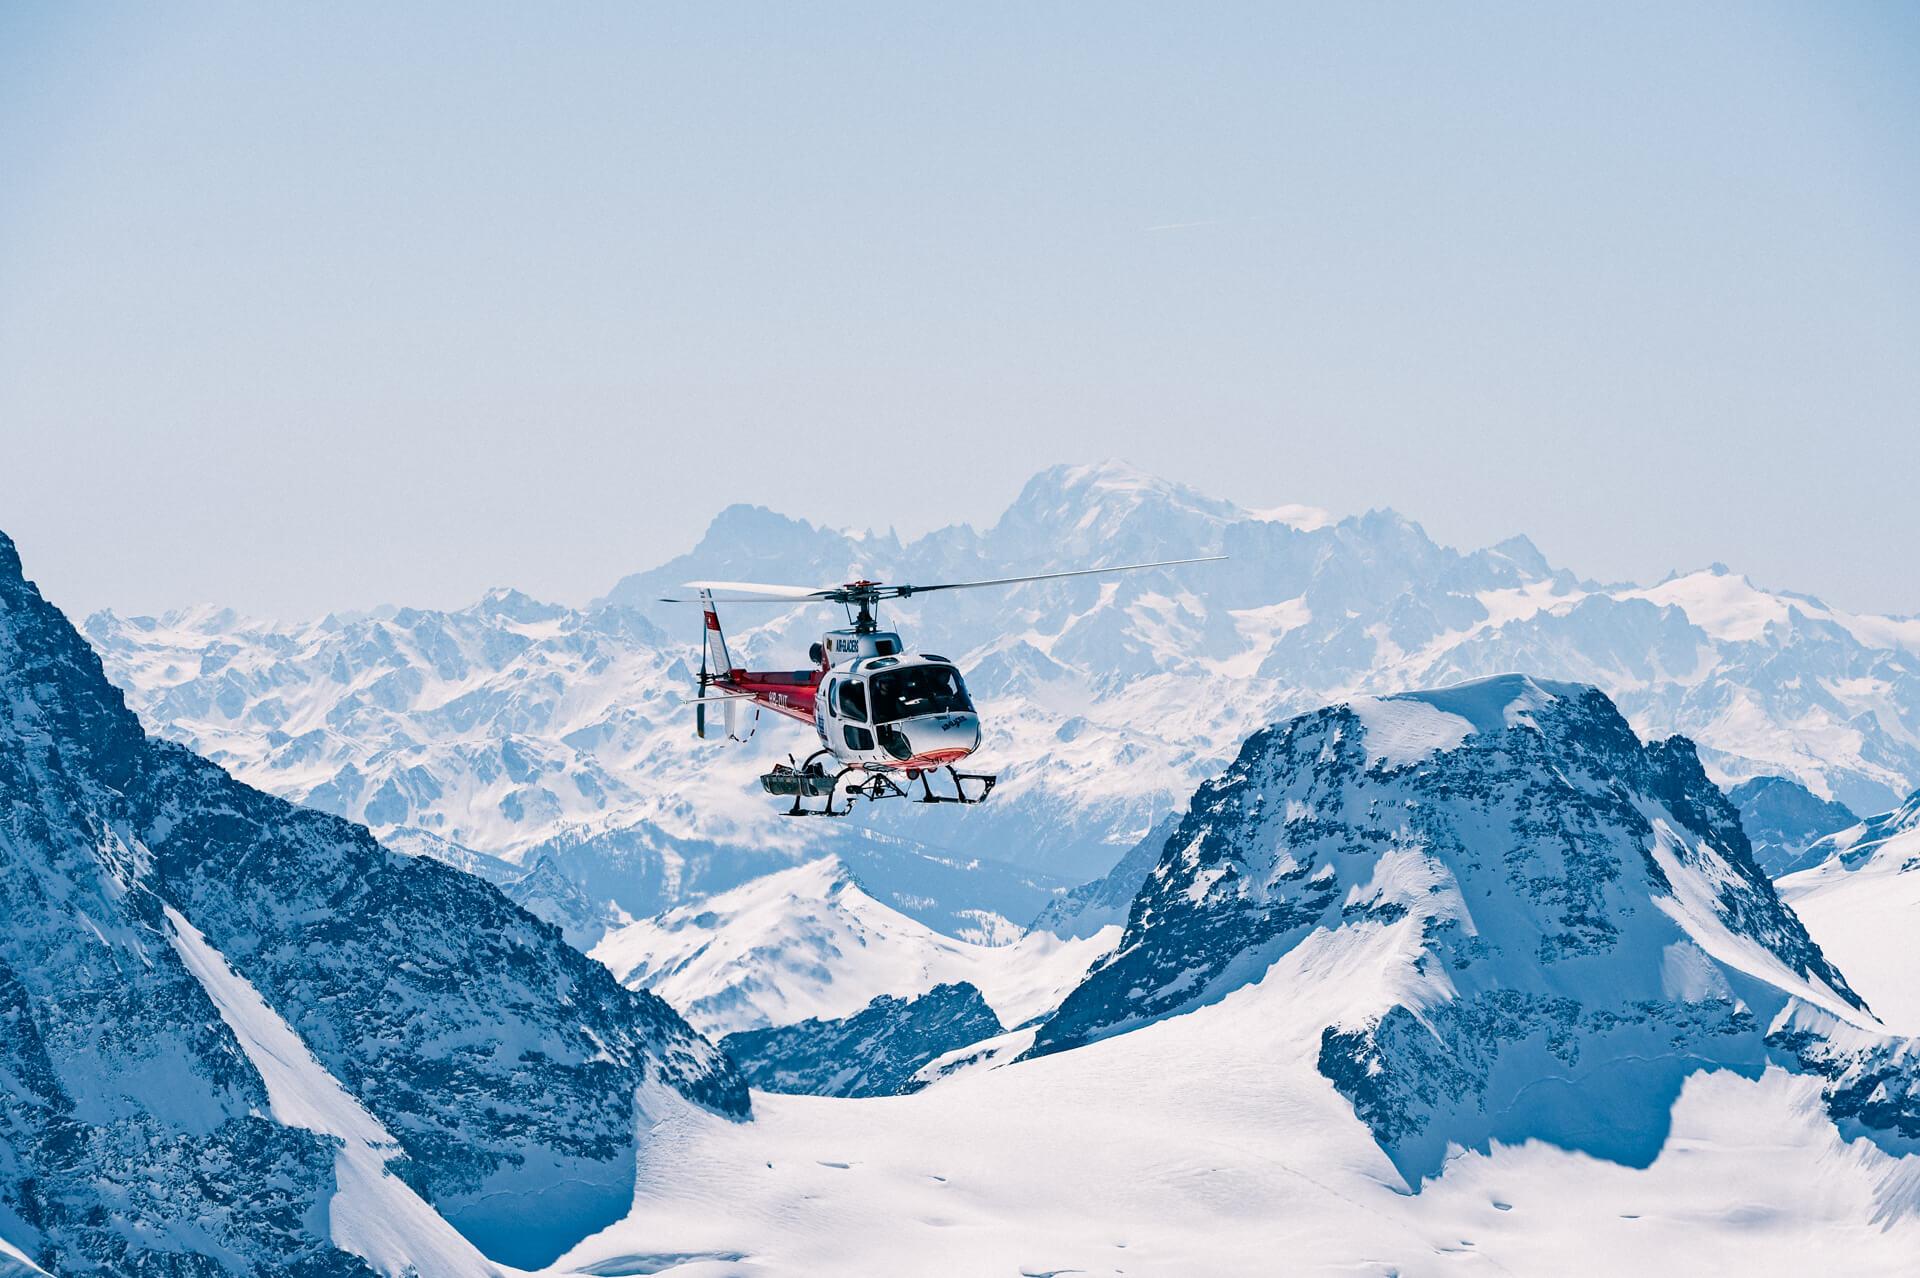 20 min Switzerland Scenic Helicopter Flight over the Jungfrau Region